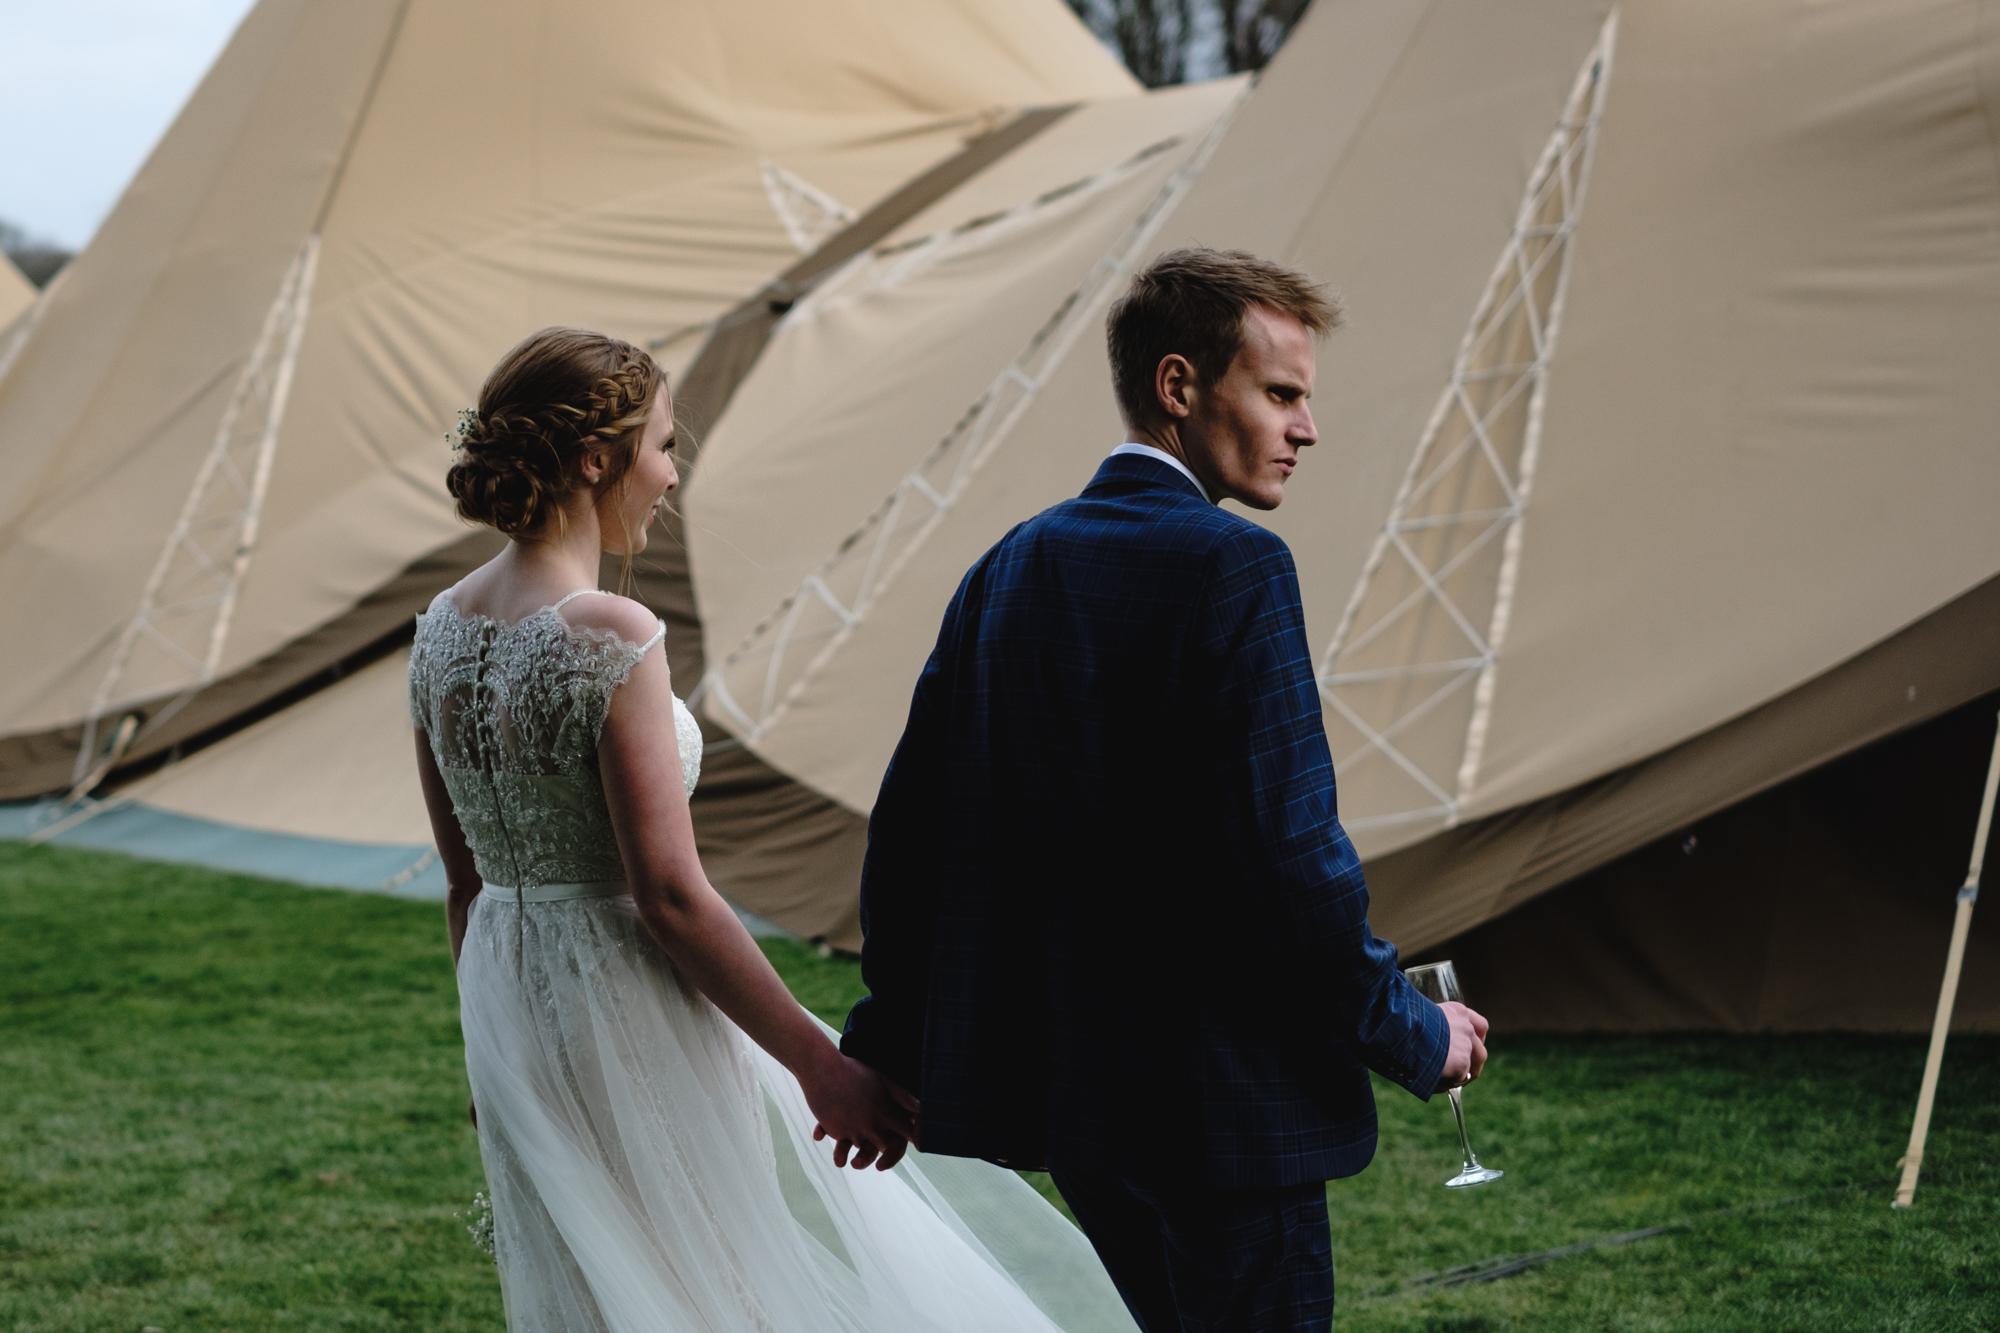 Katie and Dode weddings (130 of 207).jpg